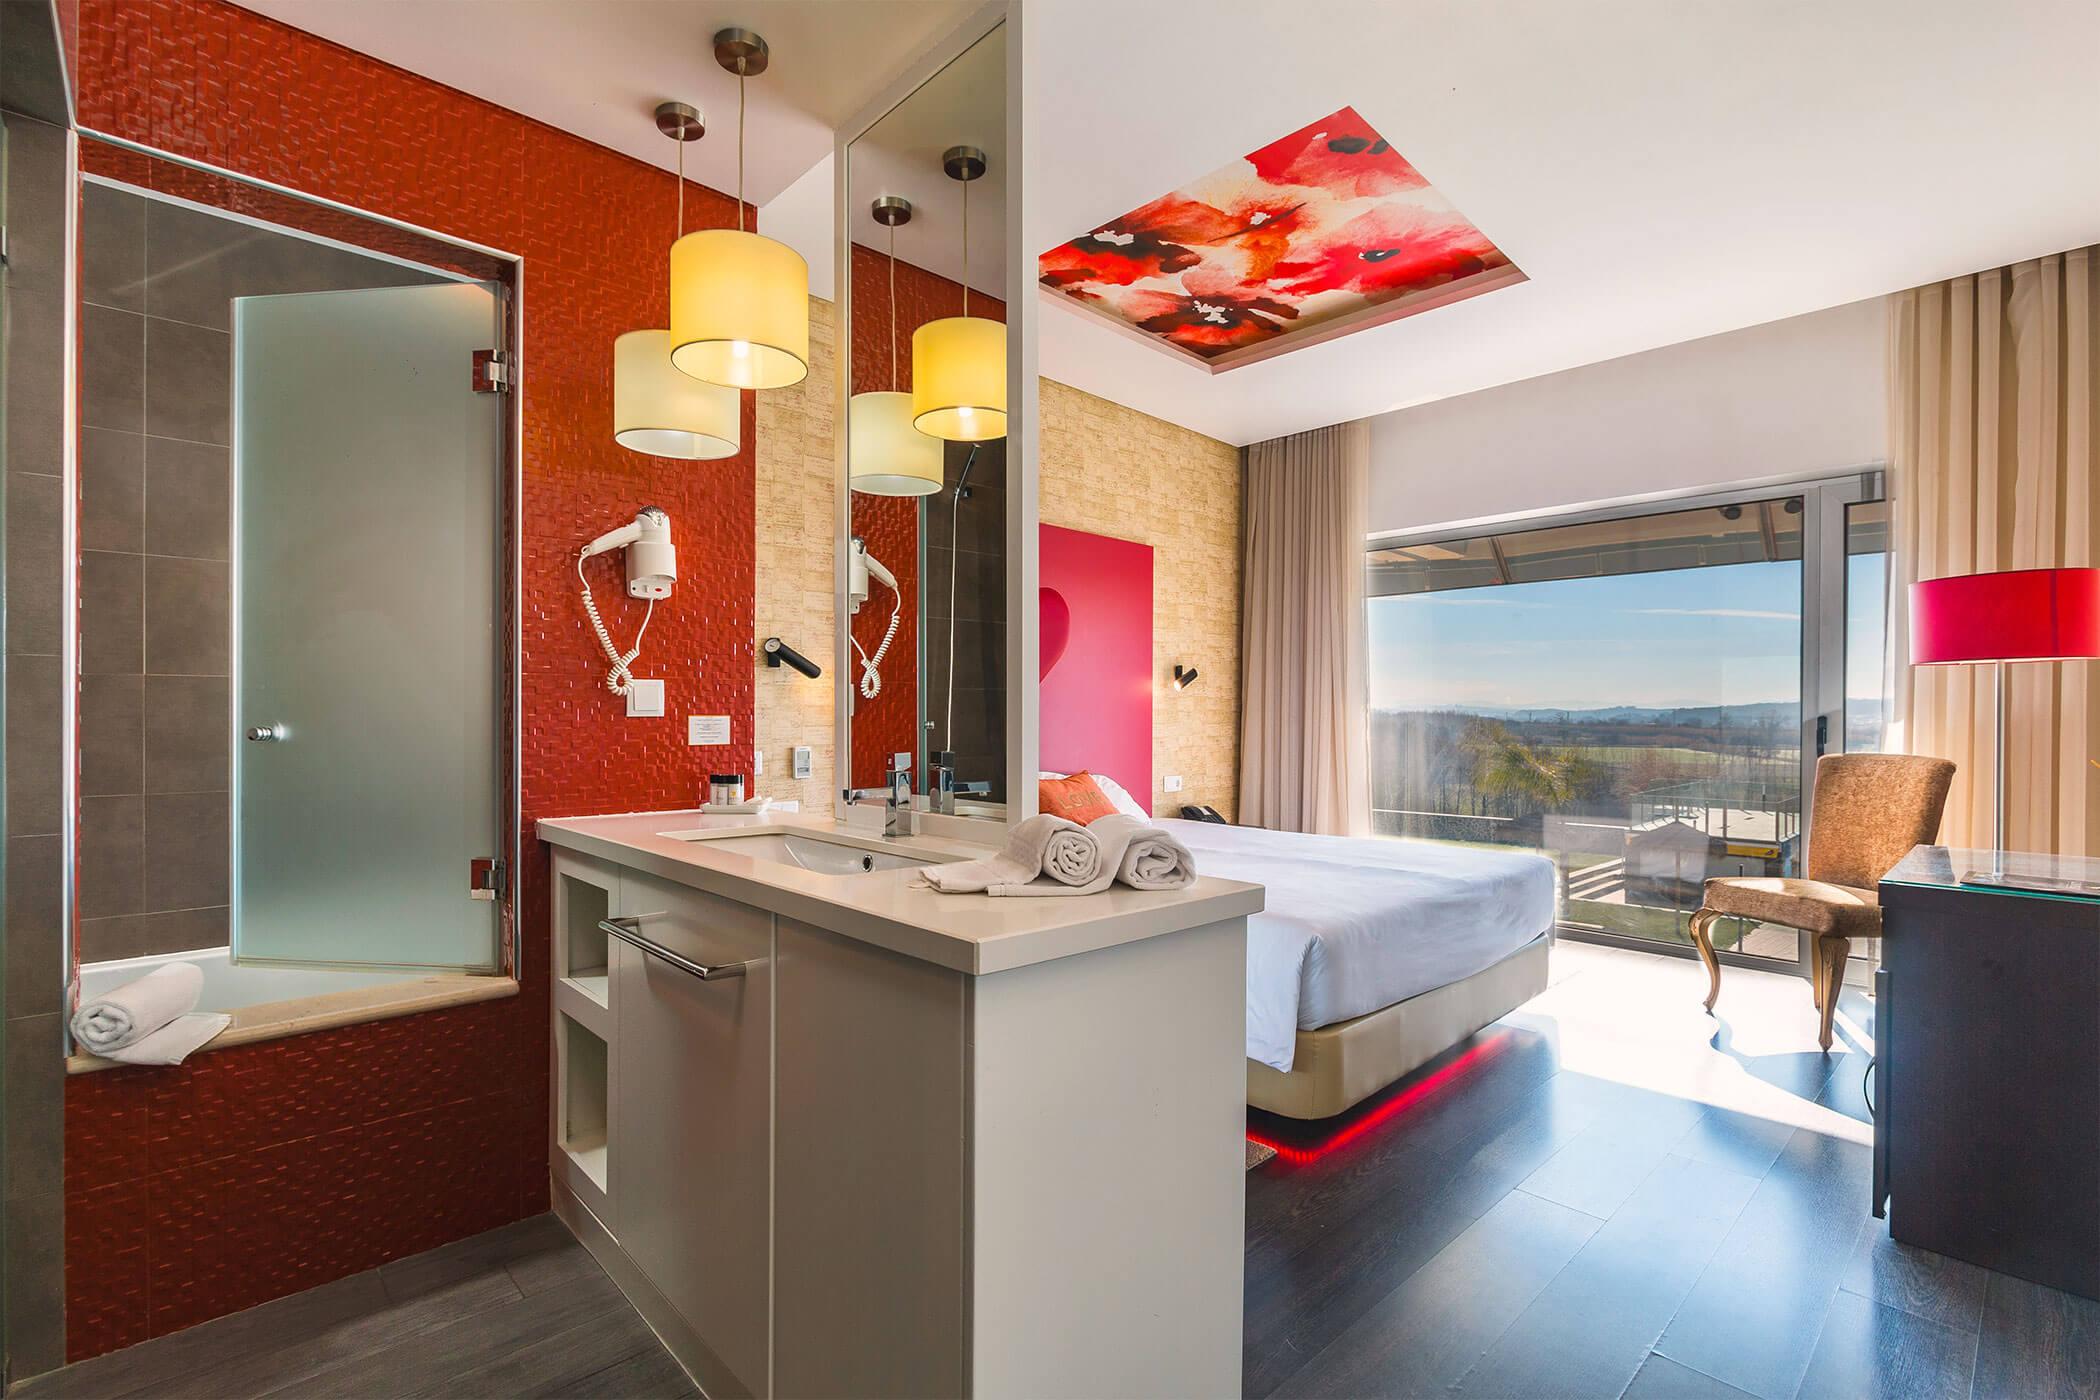 Standard Double Room Amor e Cegovim, with hydromassage bathtub - Lisotel Hotel & Spa, Leiria